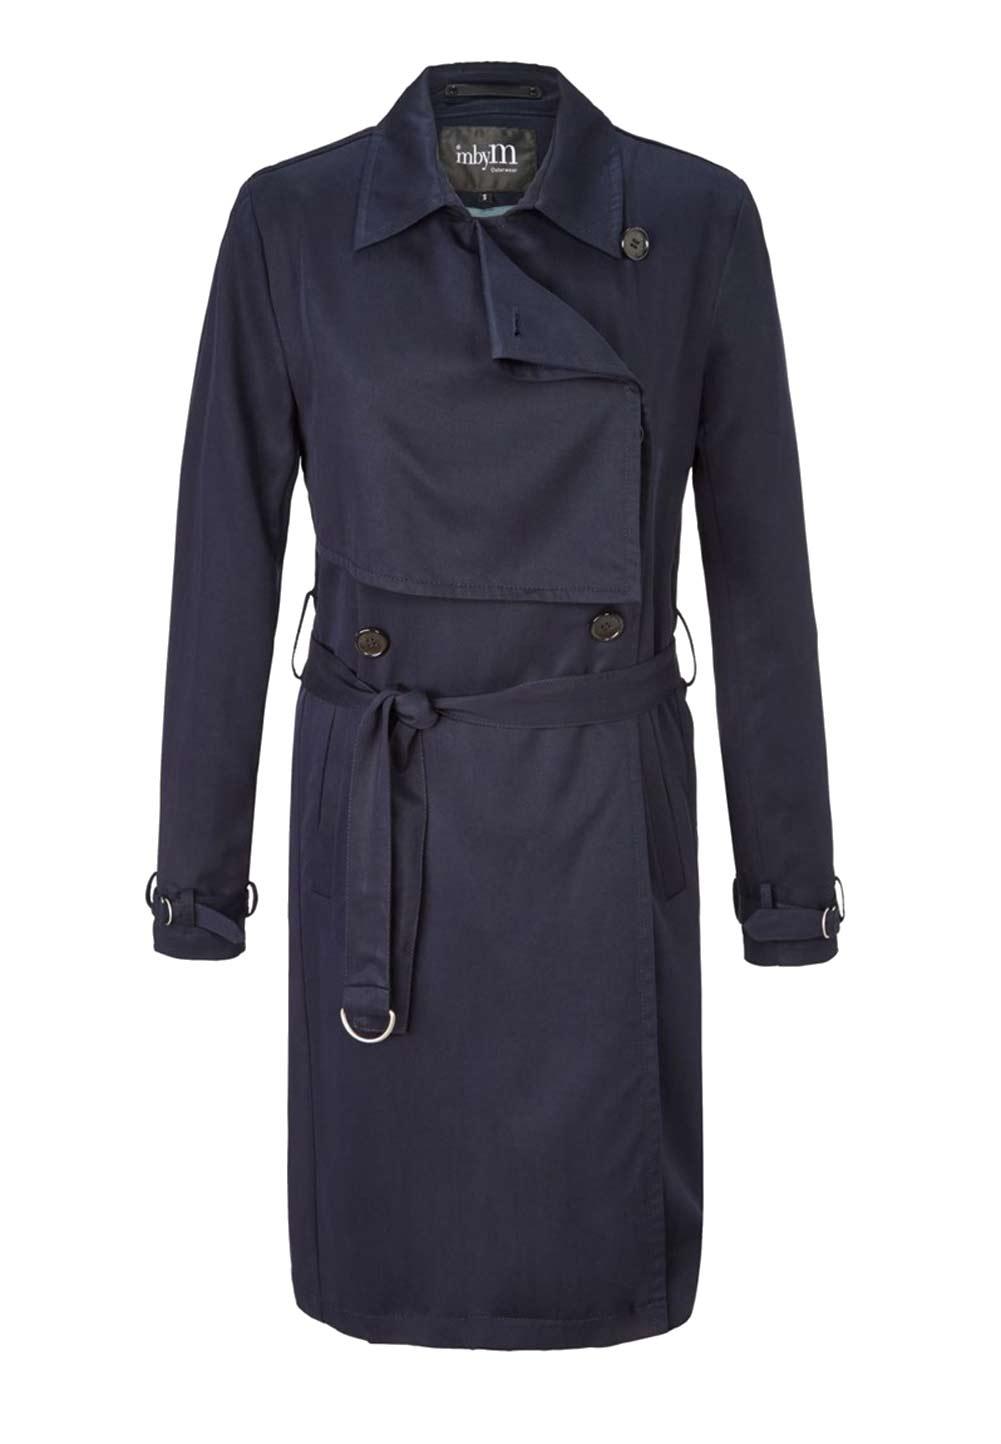 Damenmäntel Frühjahr 2021 Trenchcoat Übergangsmantel Damen Frühlingsjacke Damenmantel Mantel Damen blau 809.119 Missforty